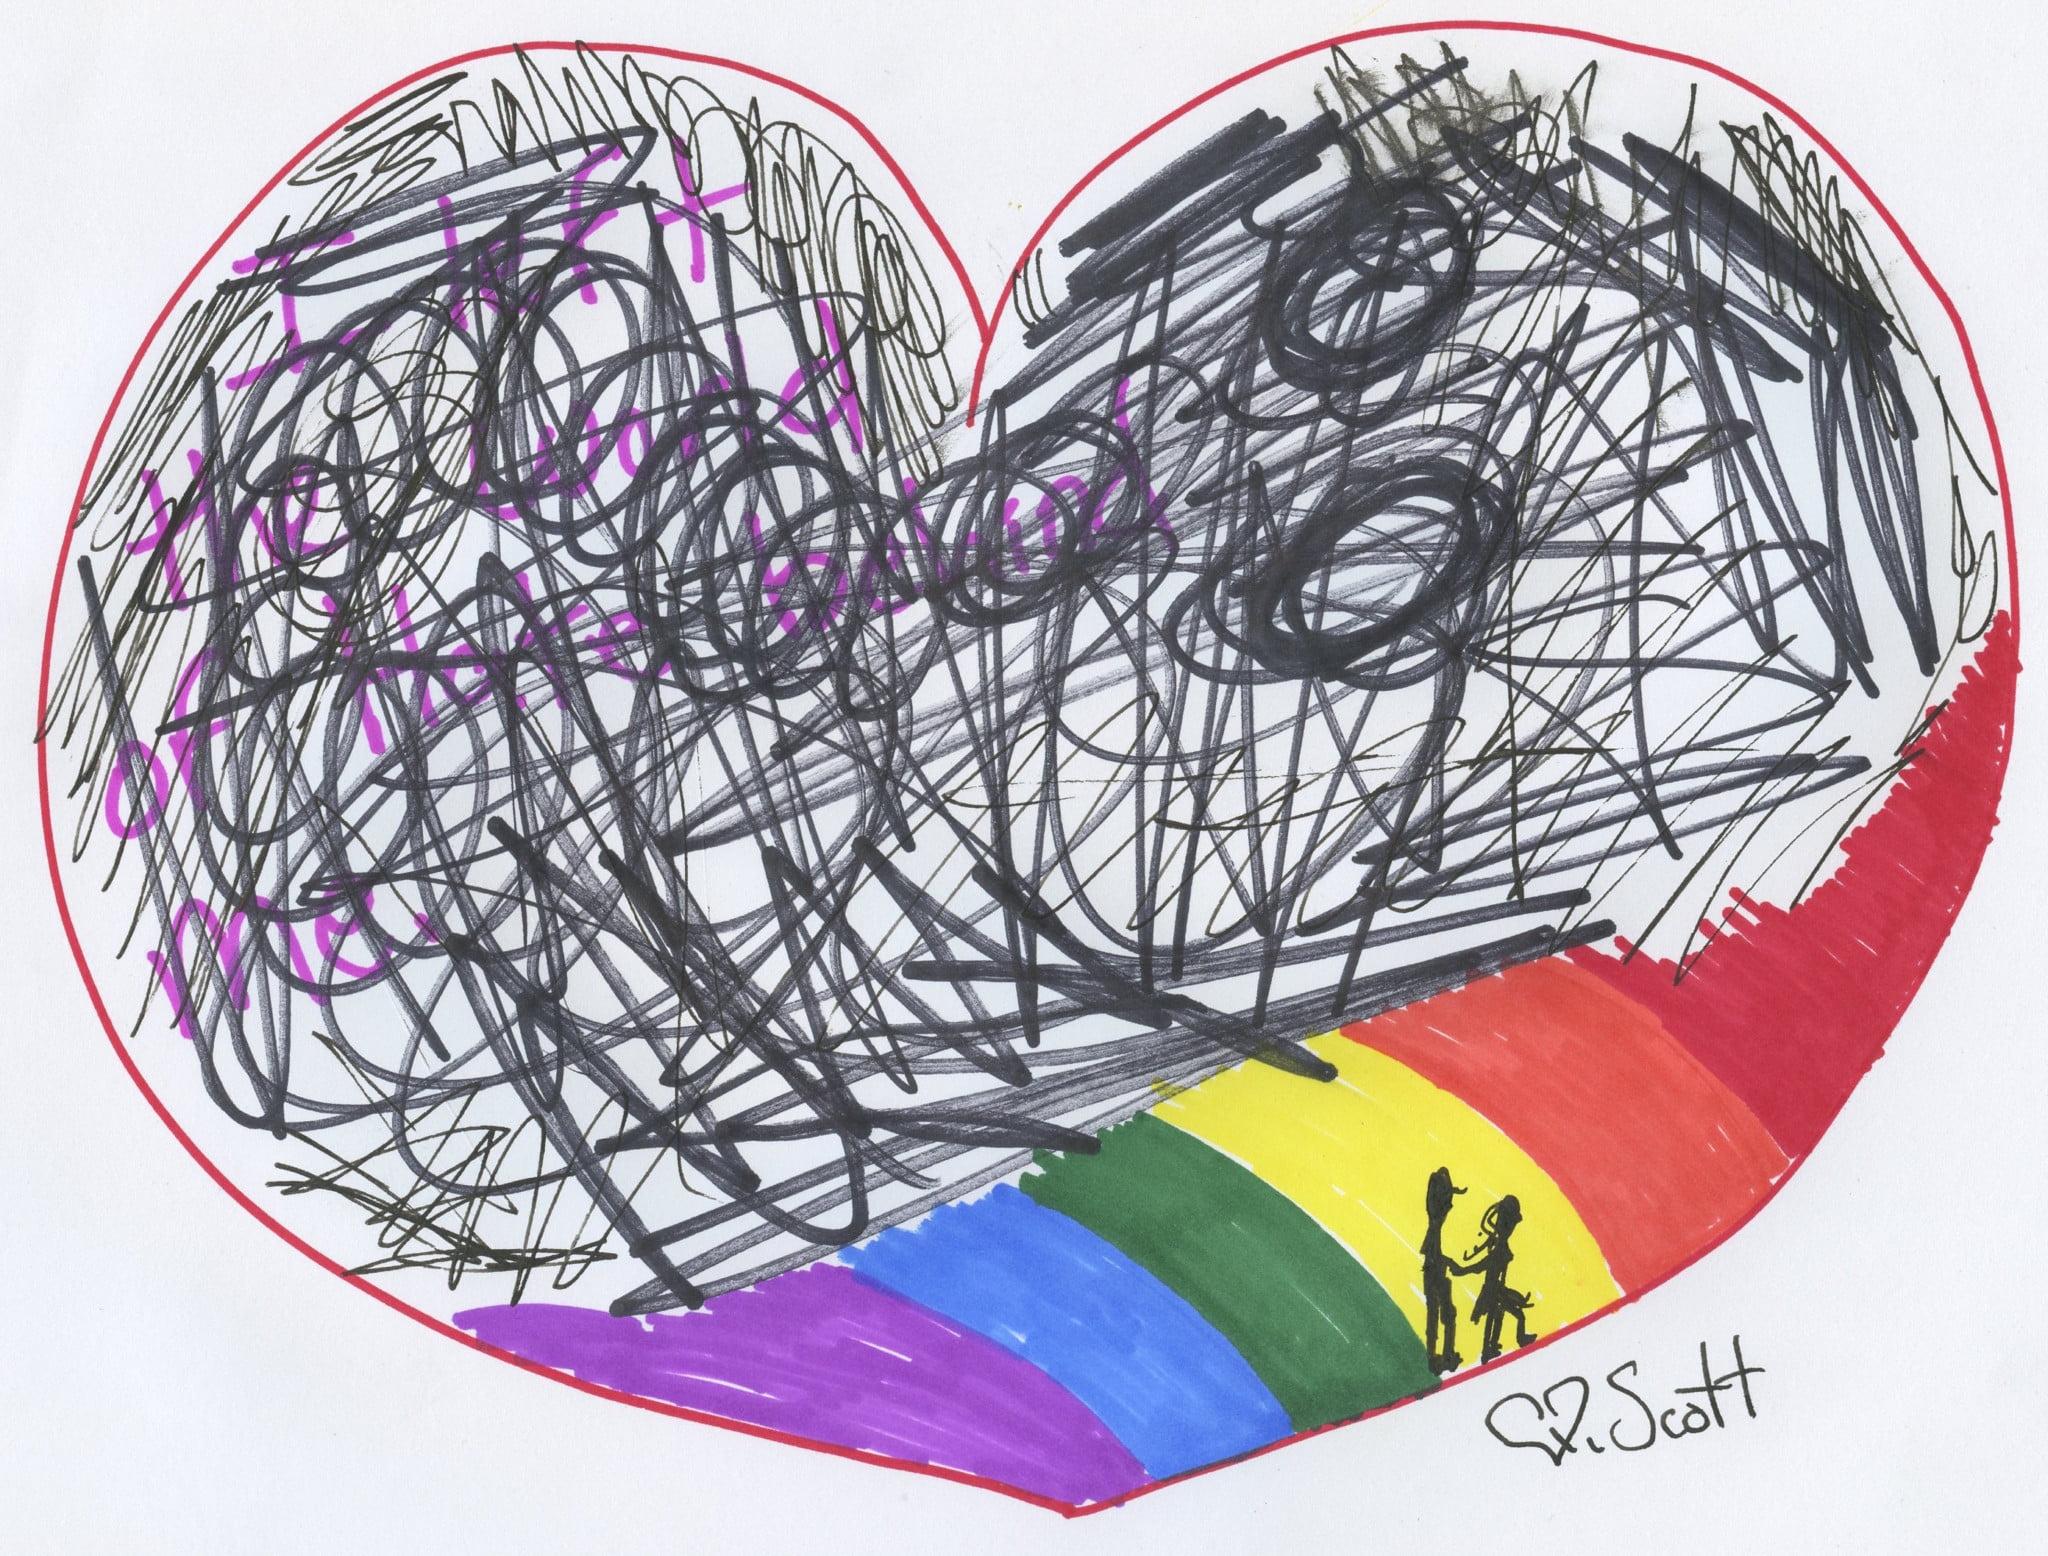 love, loving, kindness, stop hating